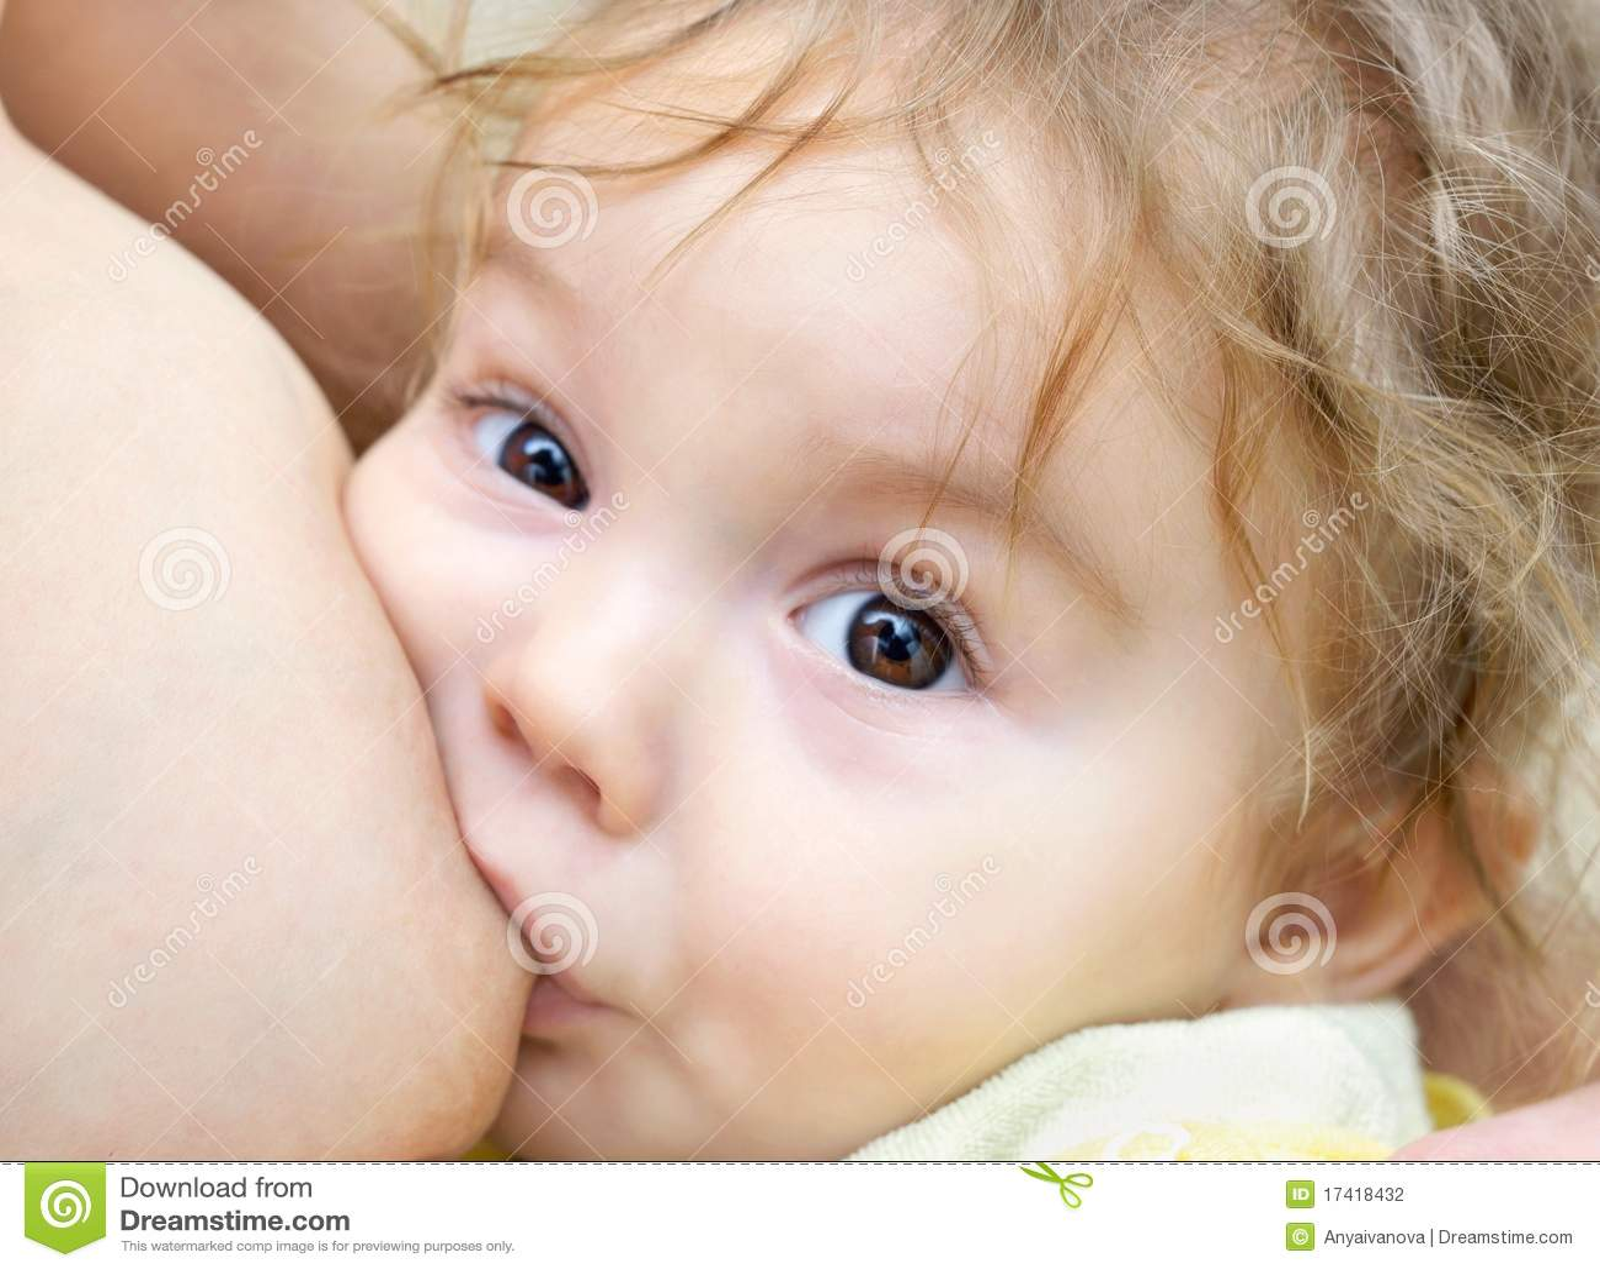 Baby Boy With Brown Eyes Nursing Stock Photo Image 17418432